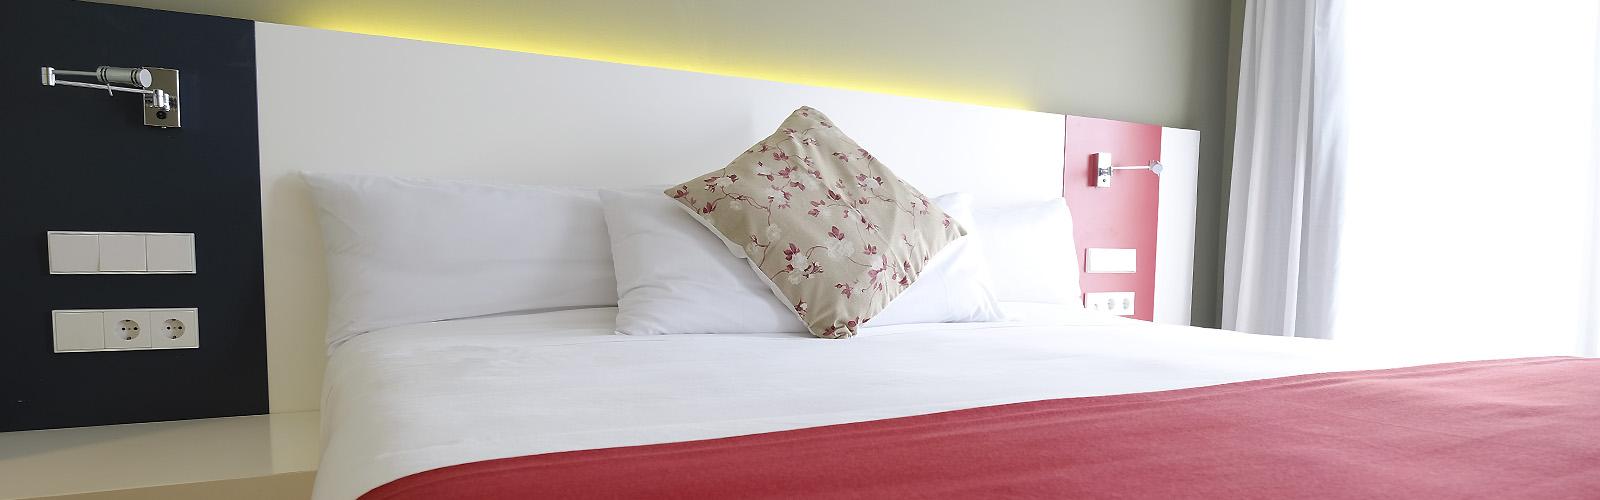 magno-suites-habitacion-portada-slider